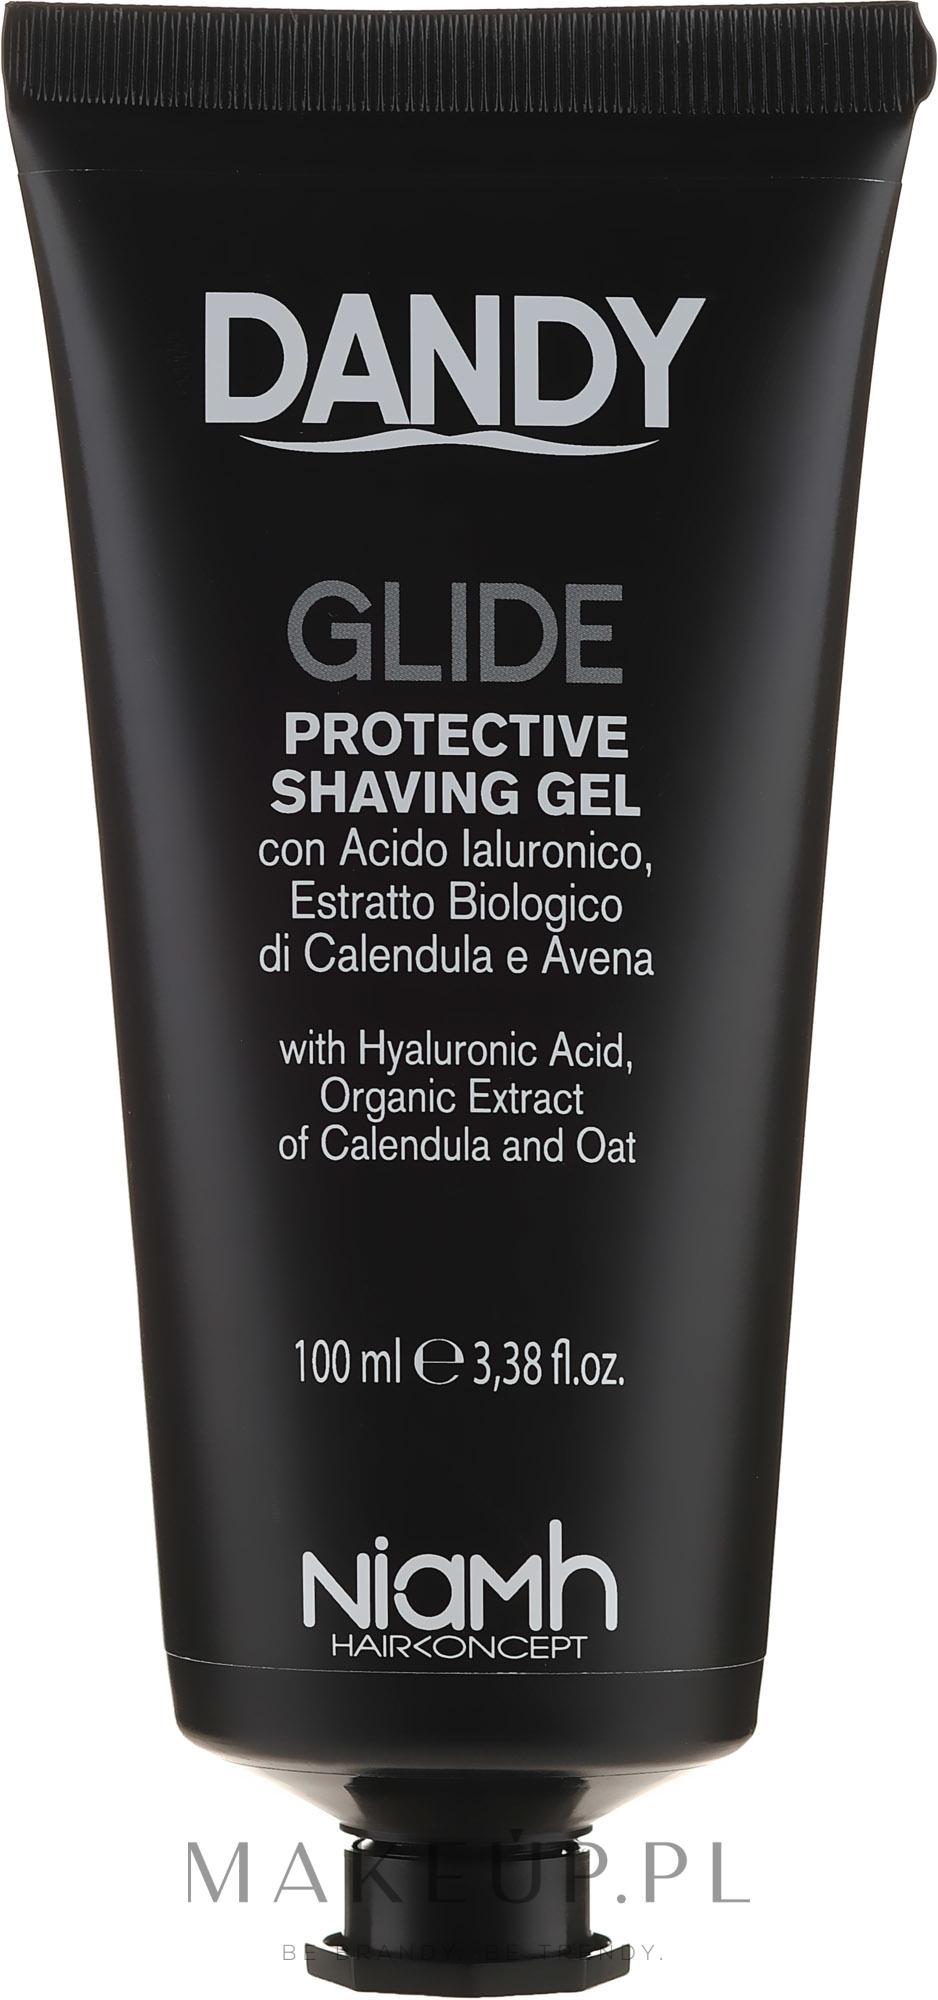 Ochronny żel do golenia - Niamh Hairconcept Dandy Glide Protective Shaving Gel — фото 100 ml